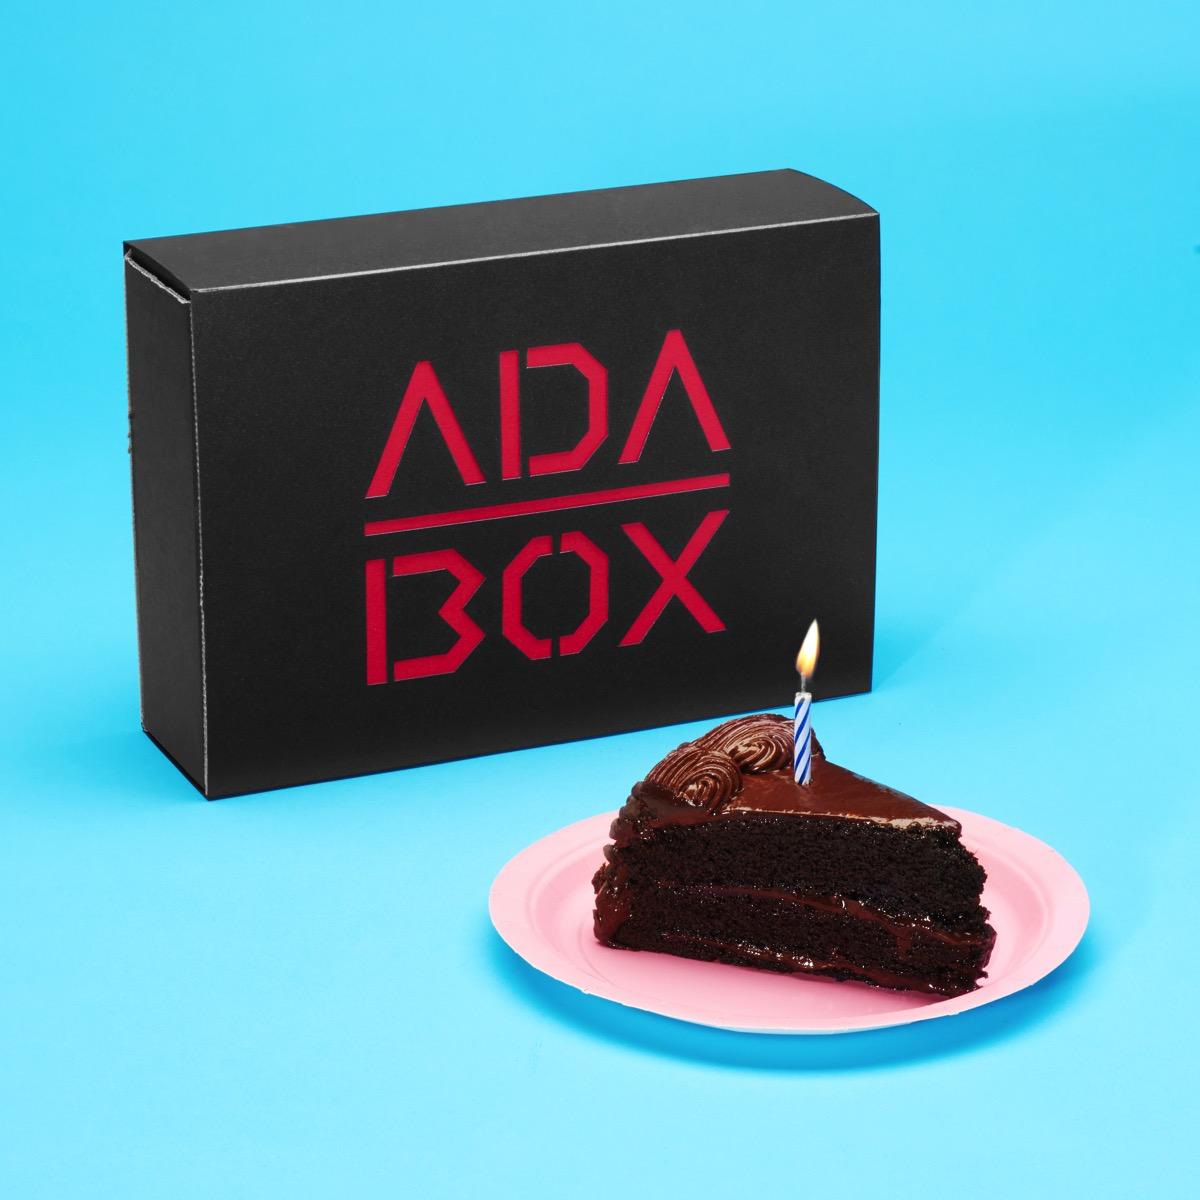 Adabox Birthday Instagram 2017 ORIG